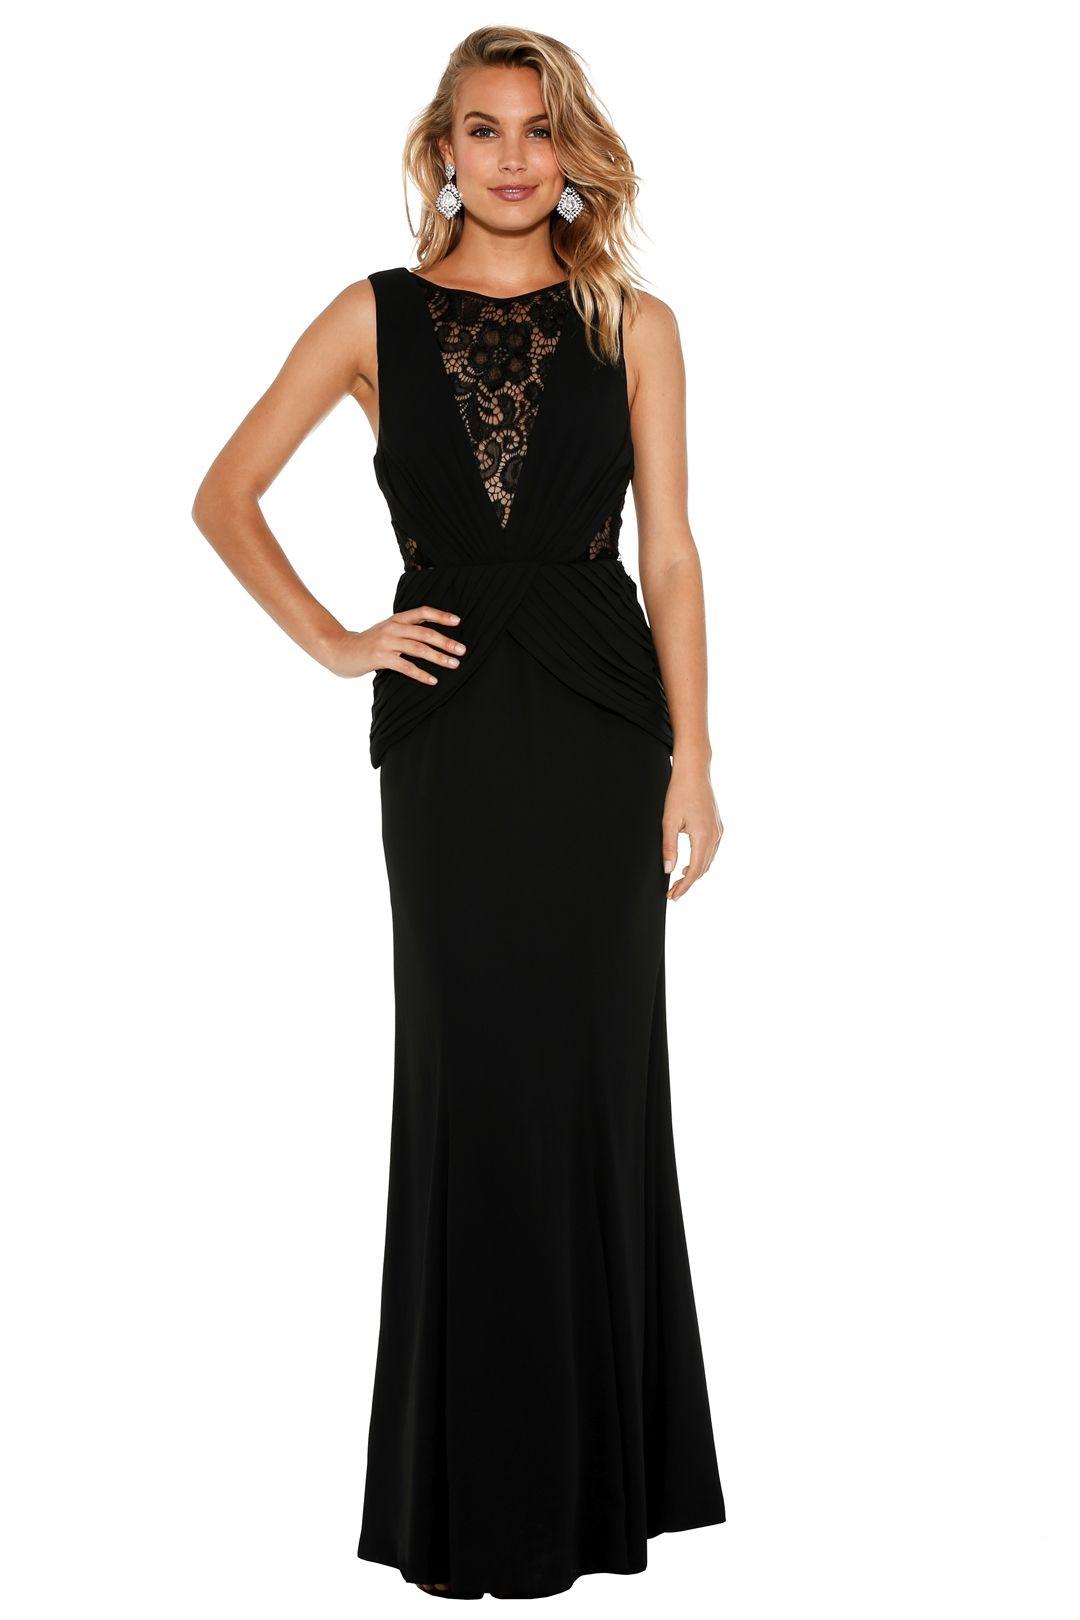 Fame & Partners - Lace Sophie Dress - Black - Front